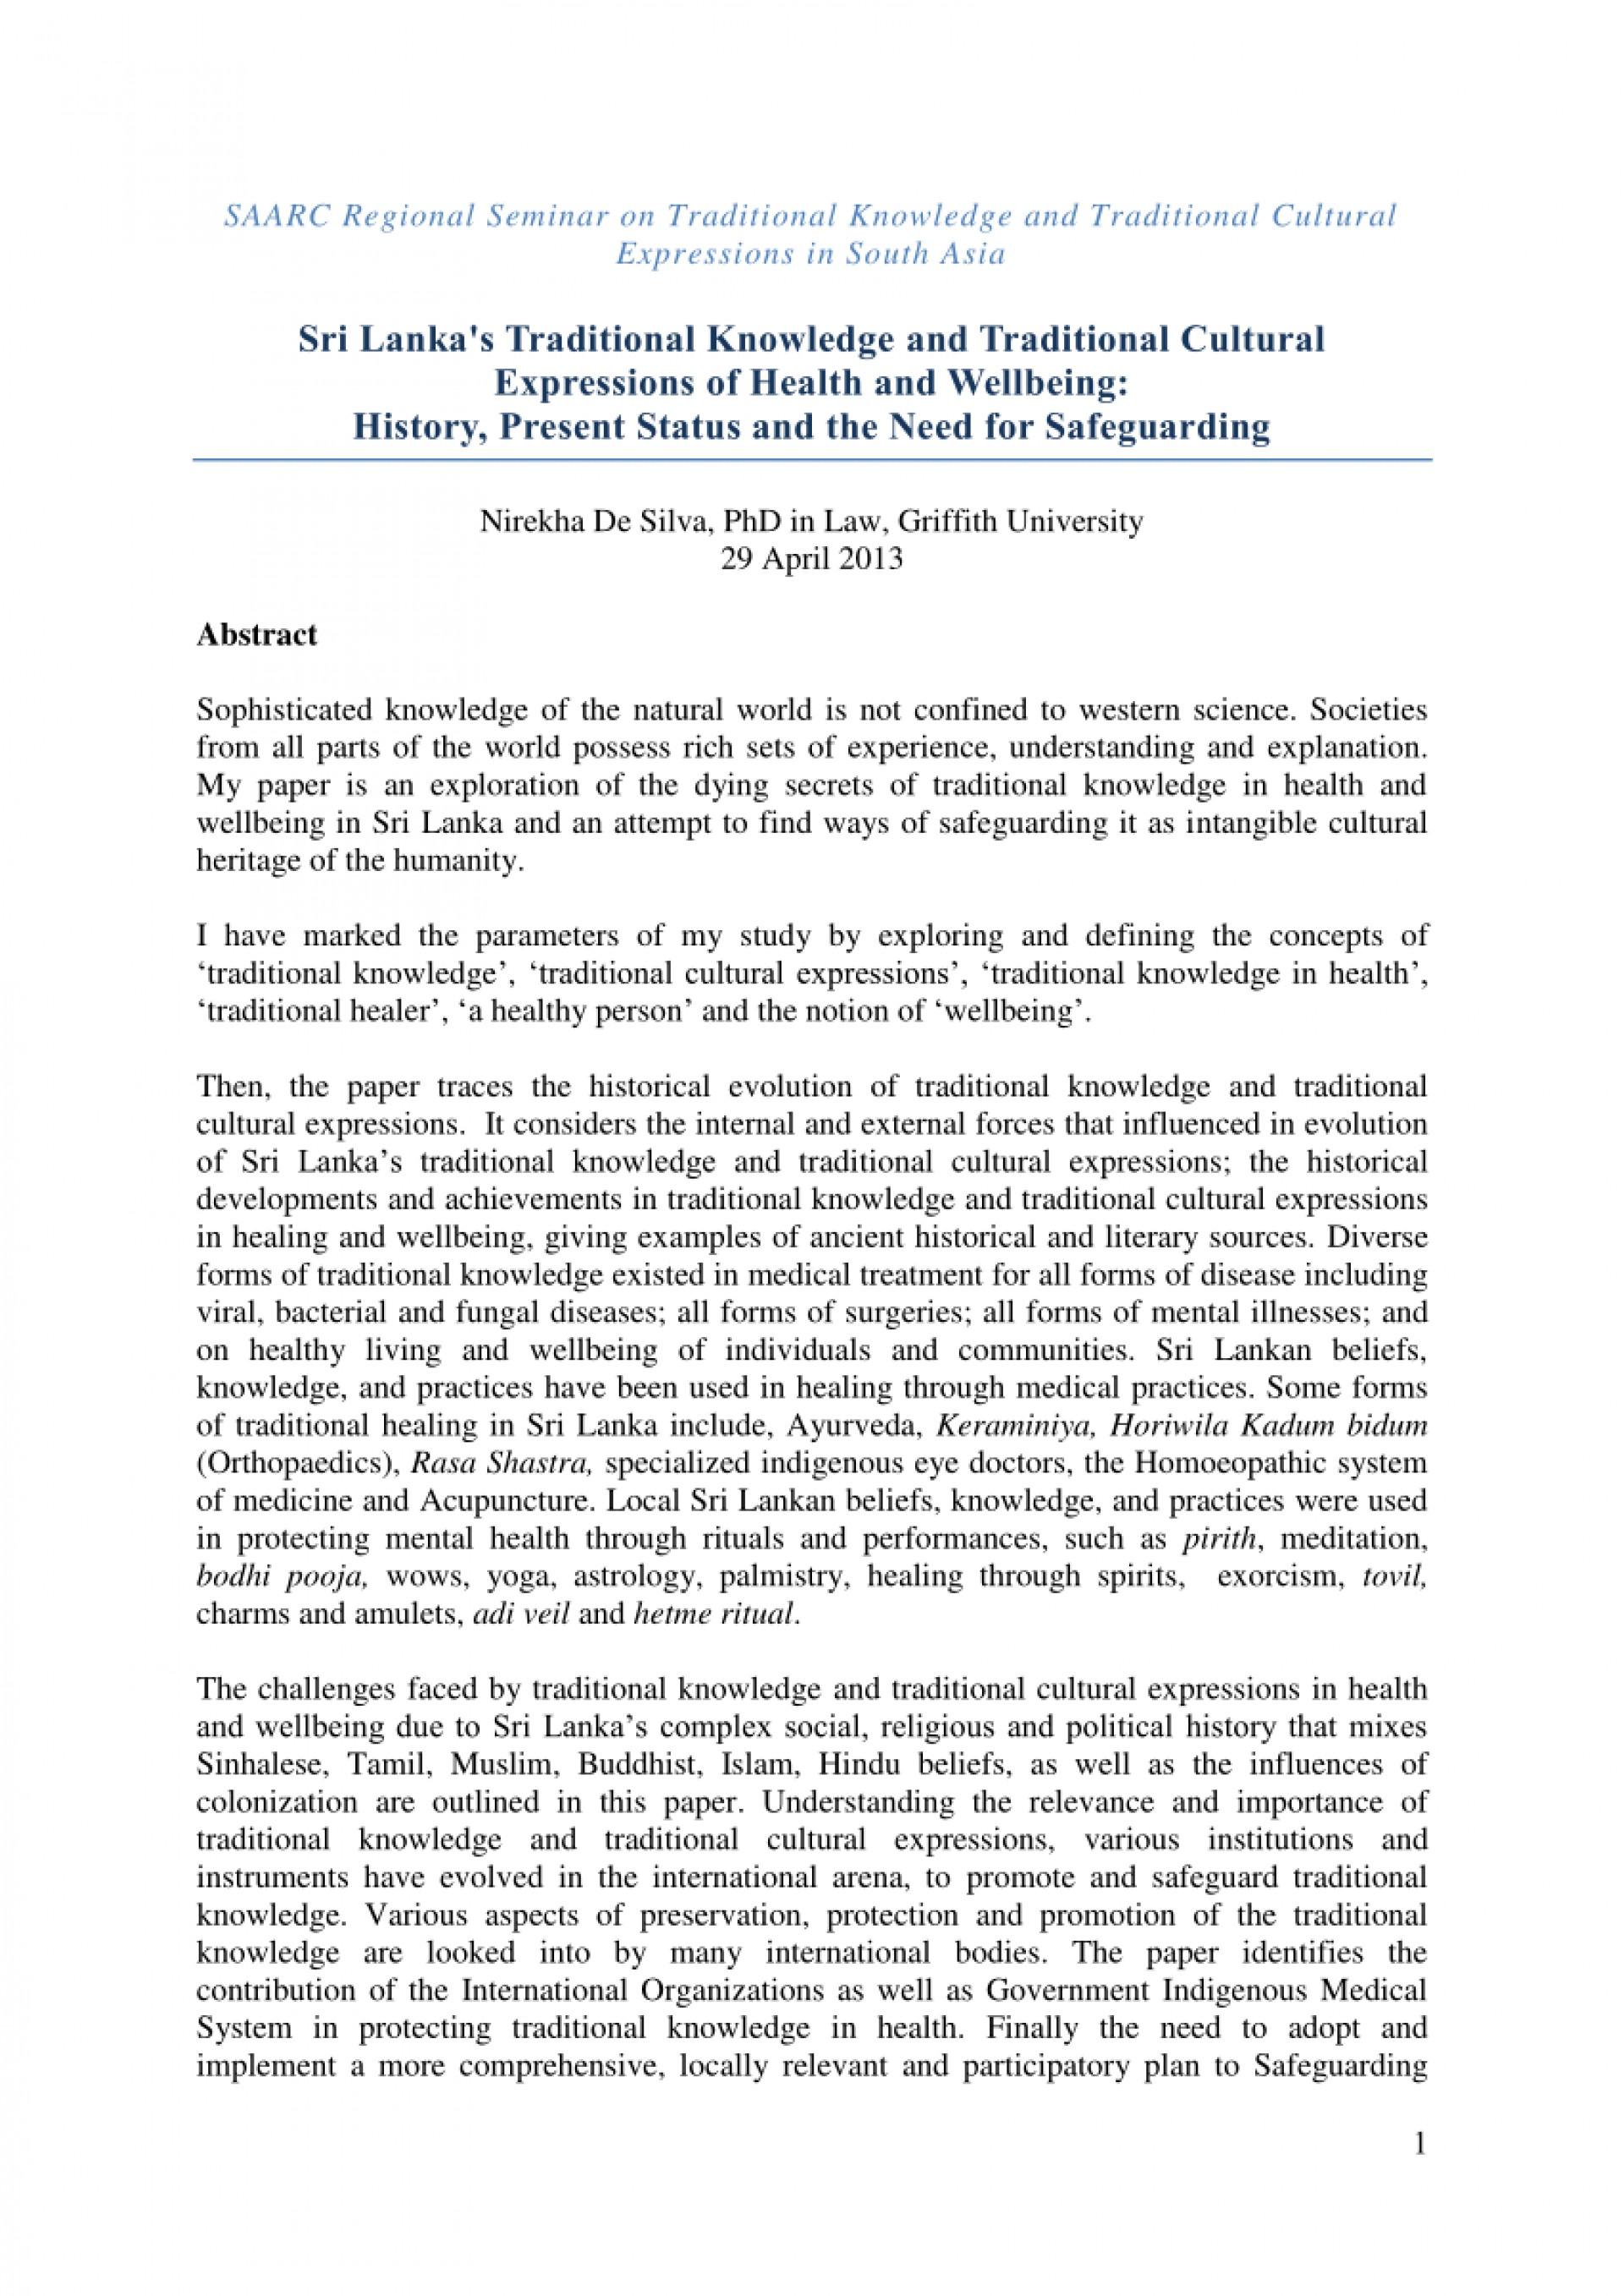 007 Essay Example Natural Resources In Sri Lanka Fantastic 1920